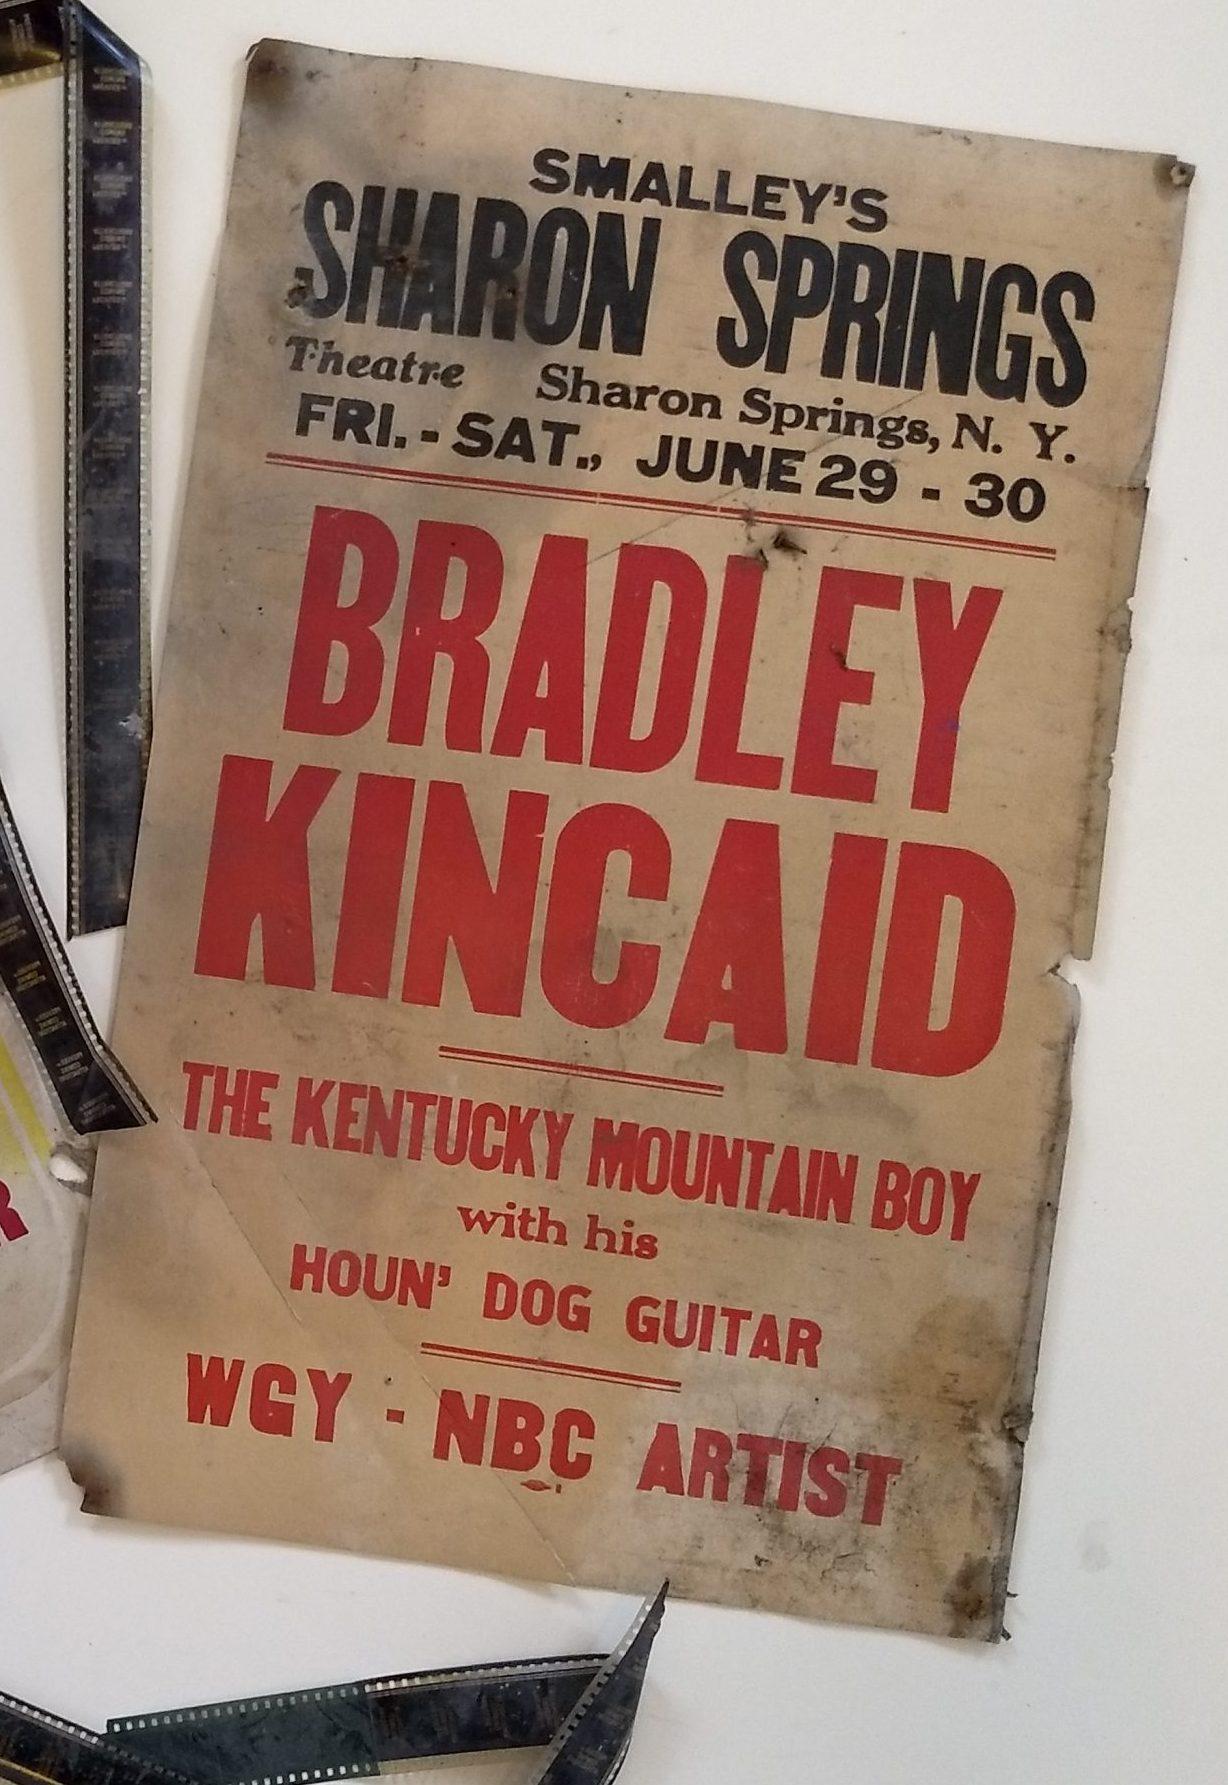 Bradley Kincaid poster